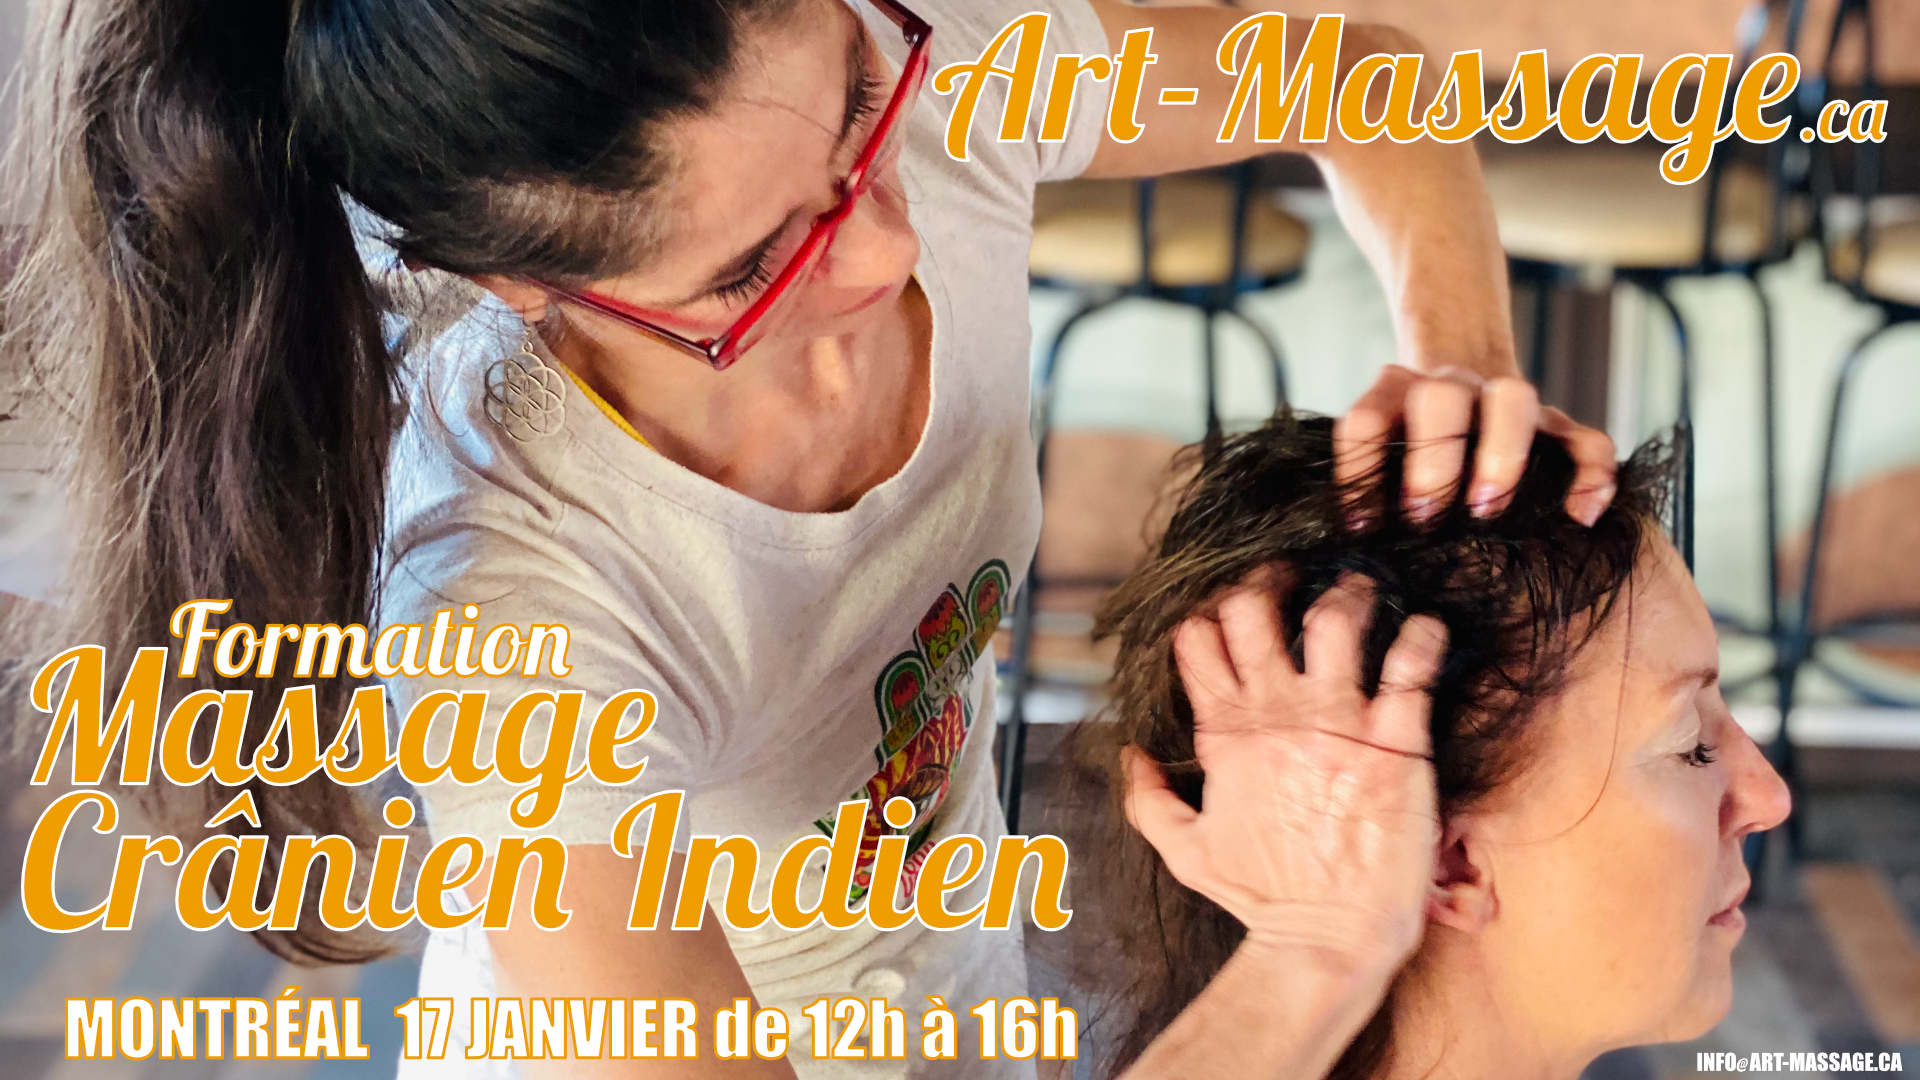 Formation Massage Cranien Indien avec Art-Massage